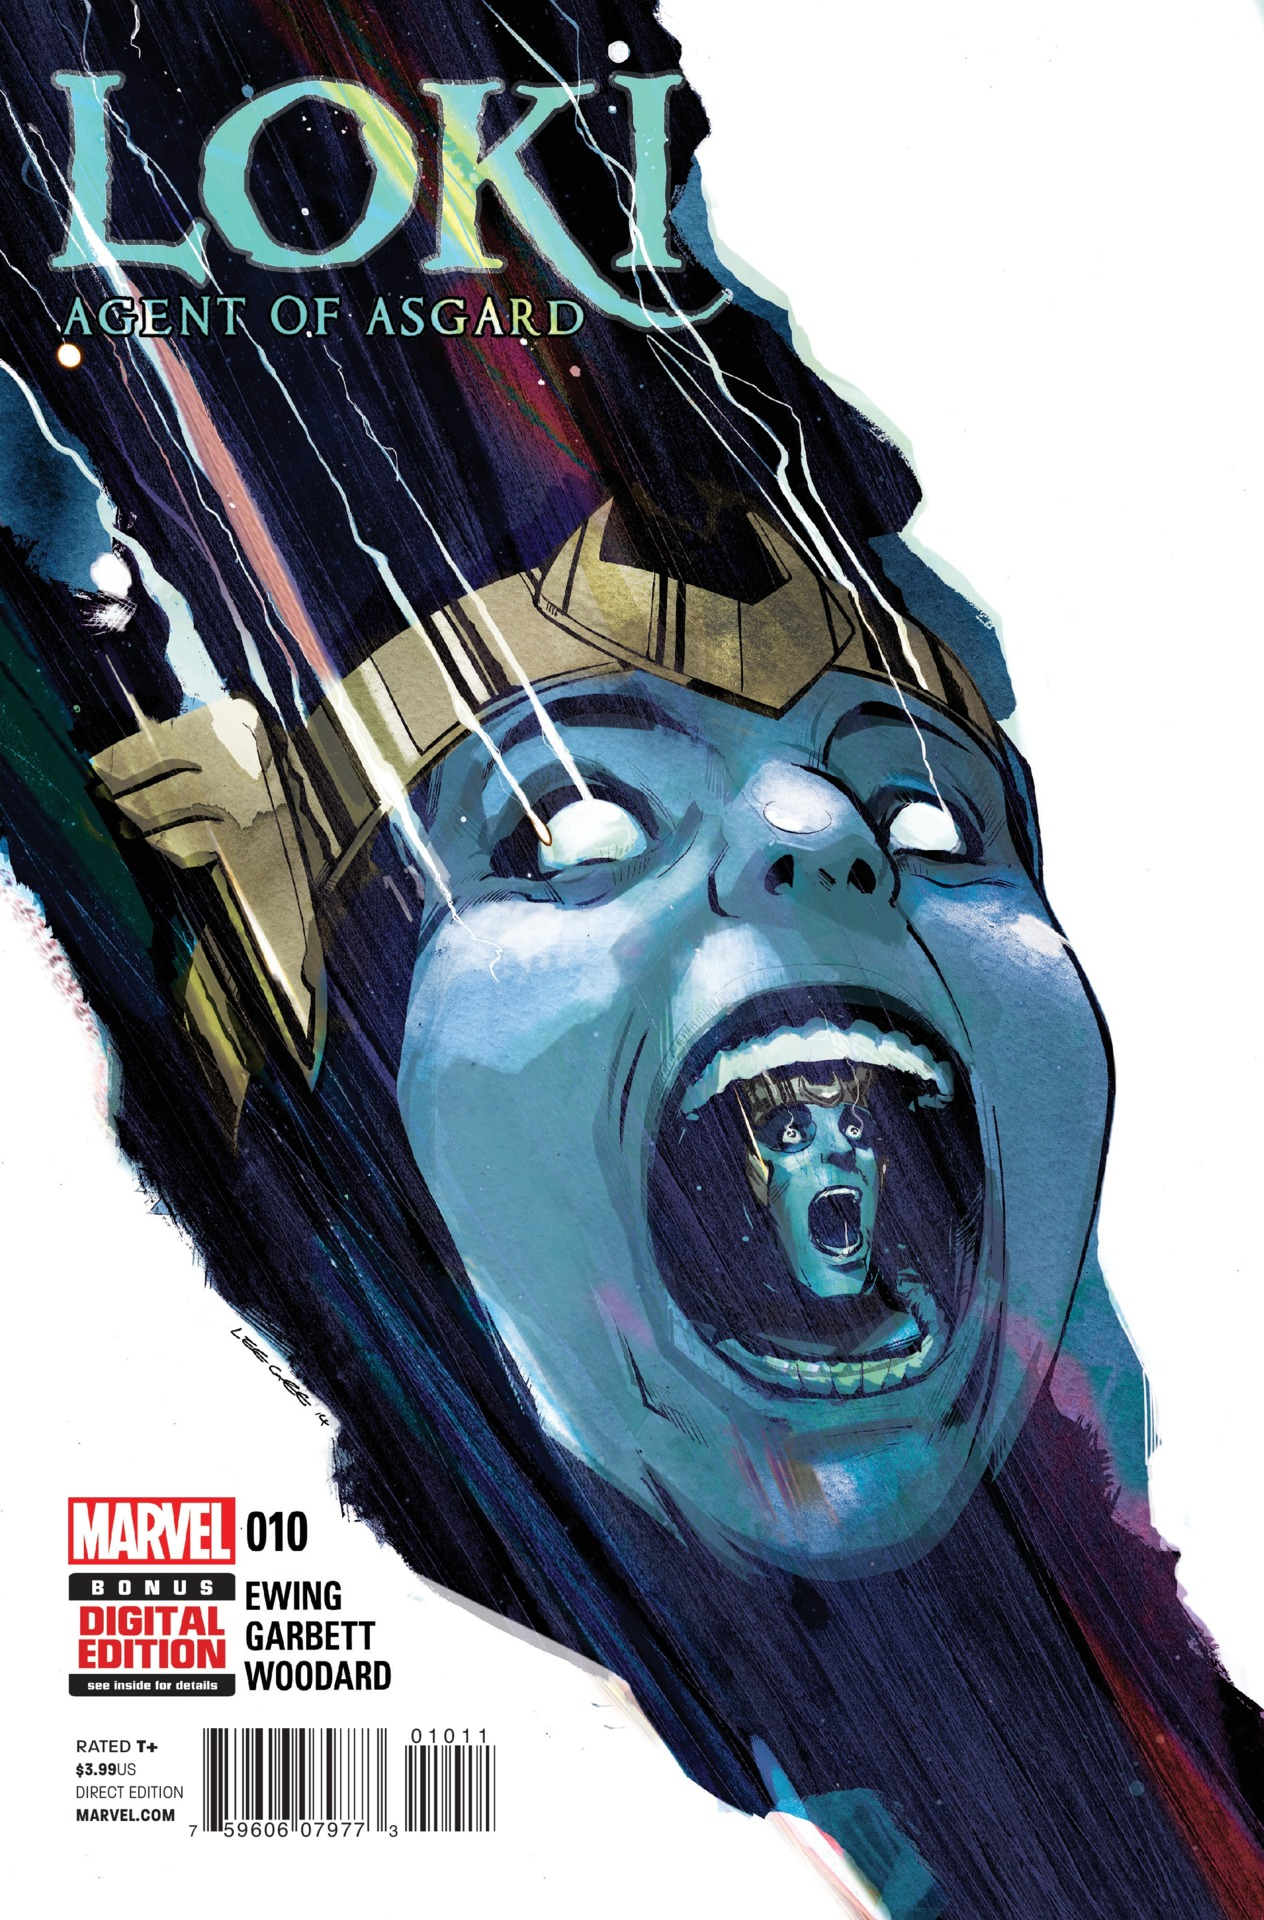 Loki: Agent of Asgard Vol 1 10